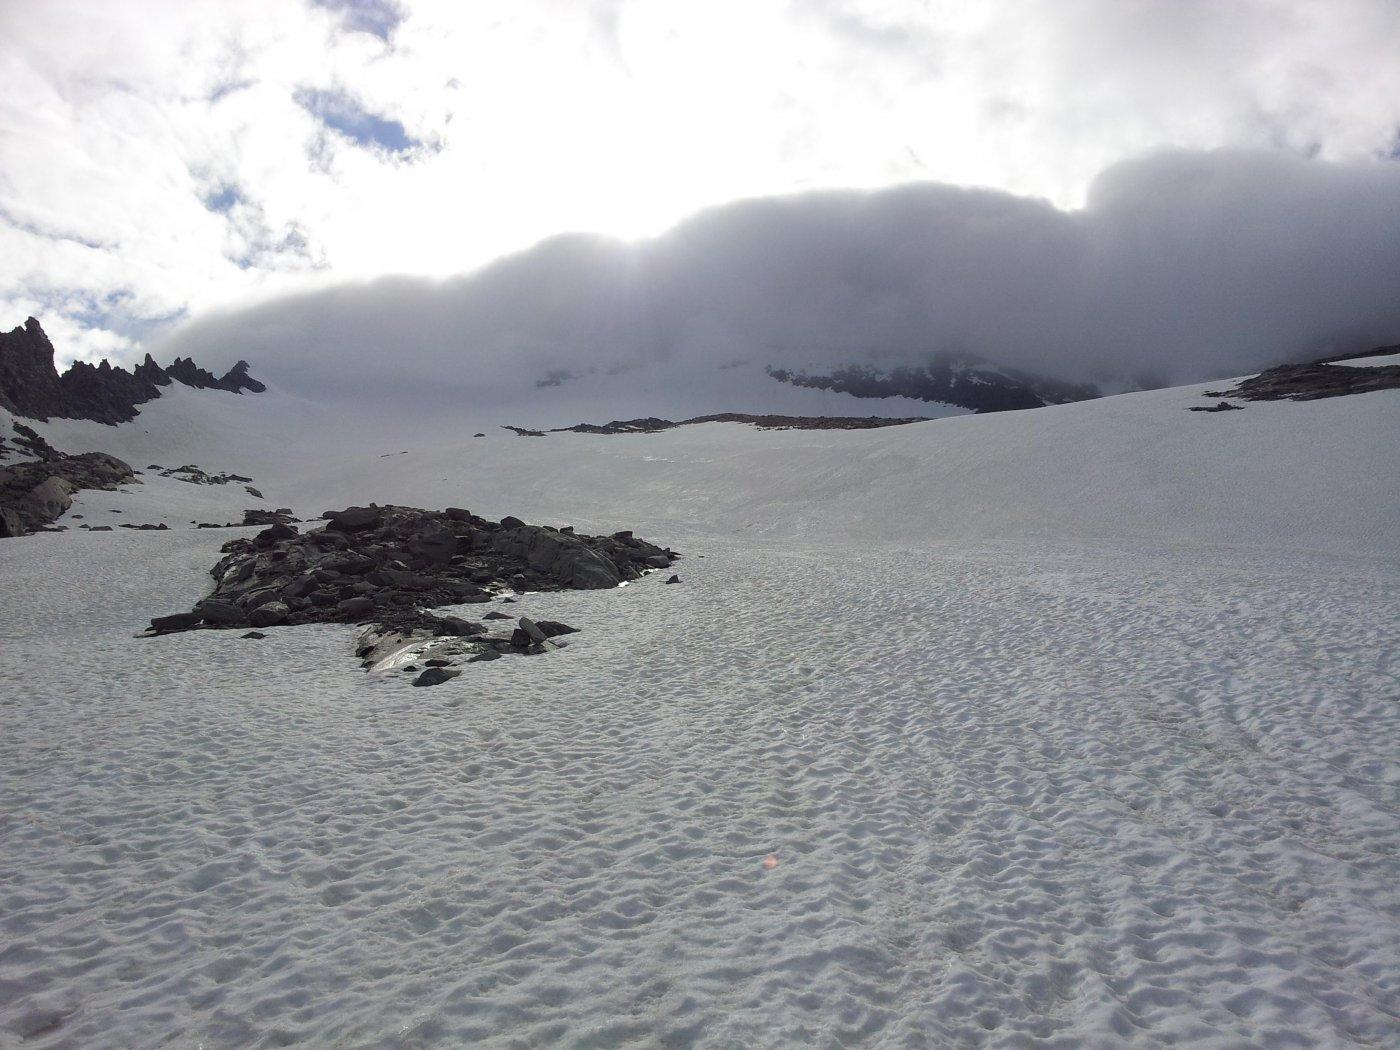 Scrondocumulo al Pass e in Vetta